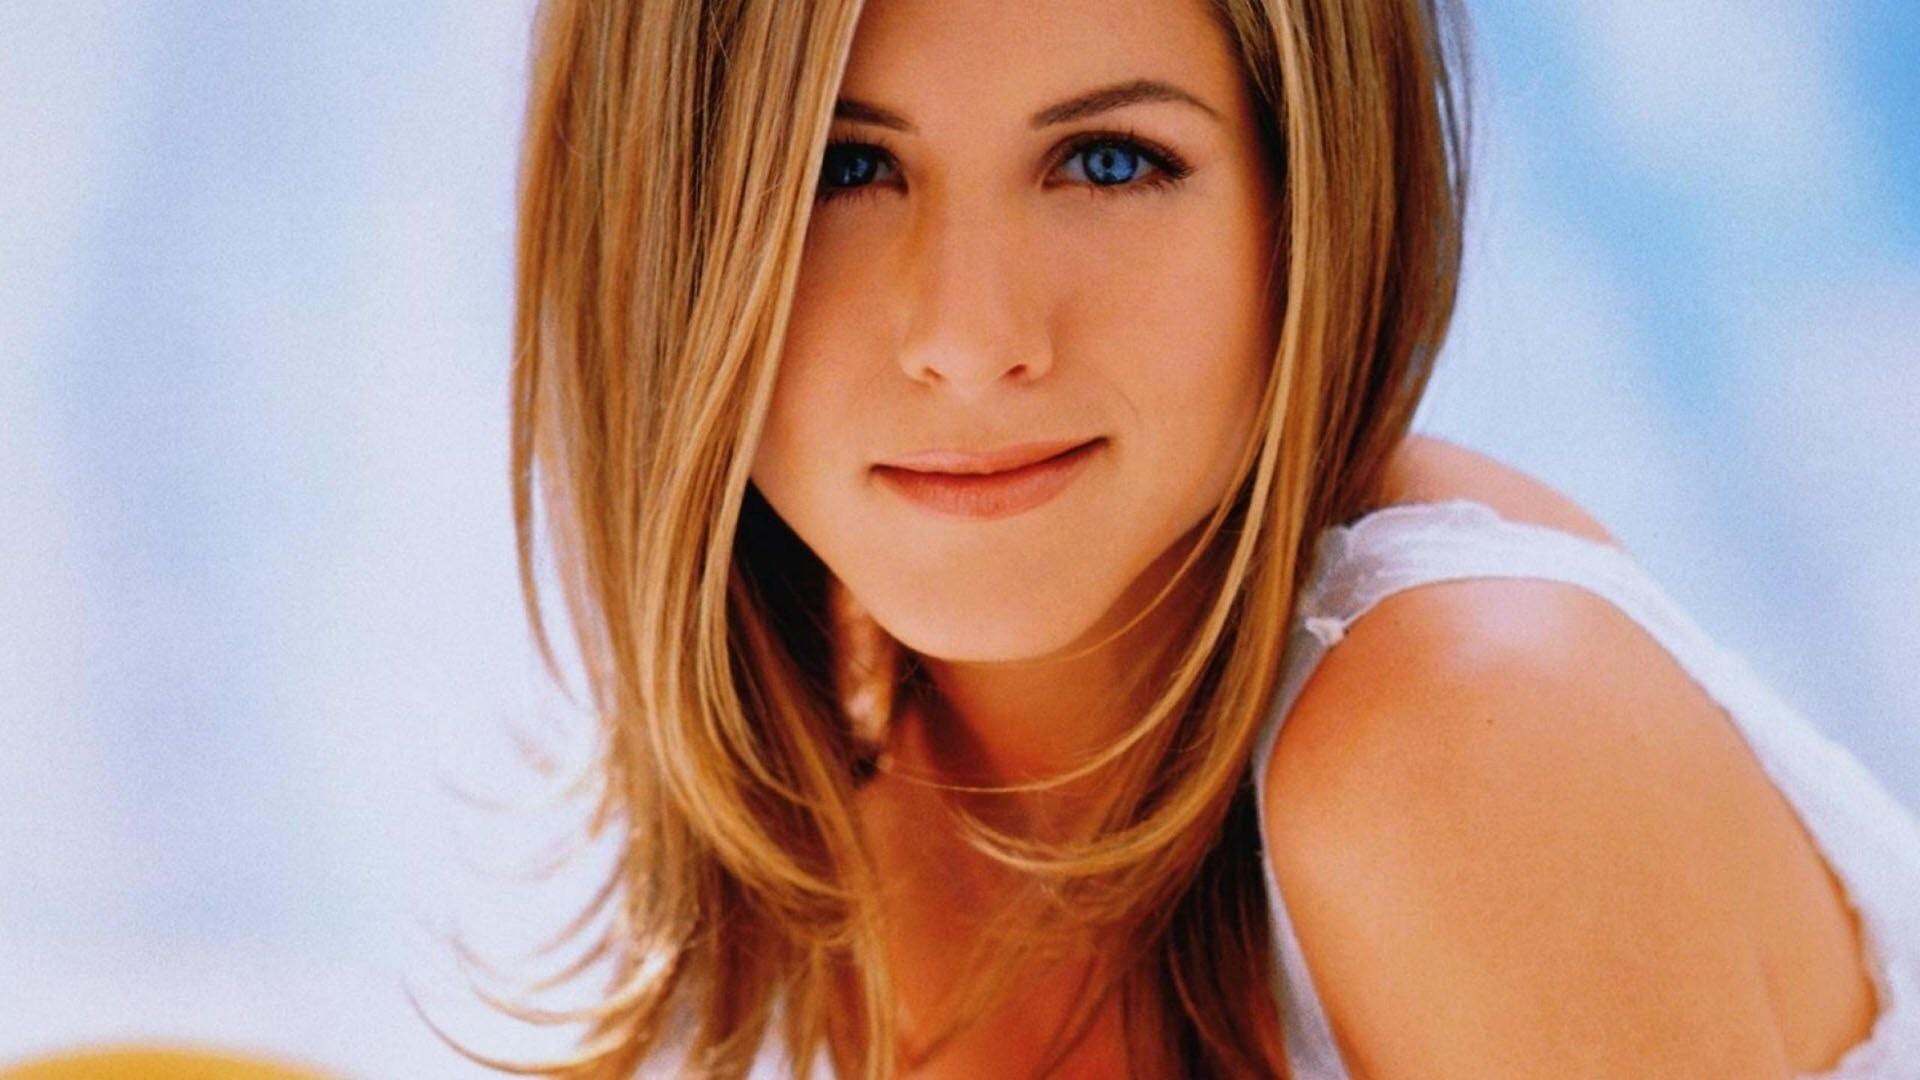 jennifer aniston celebrity actress - photo #16